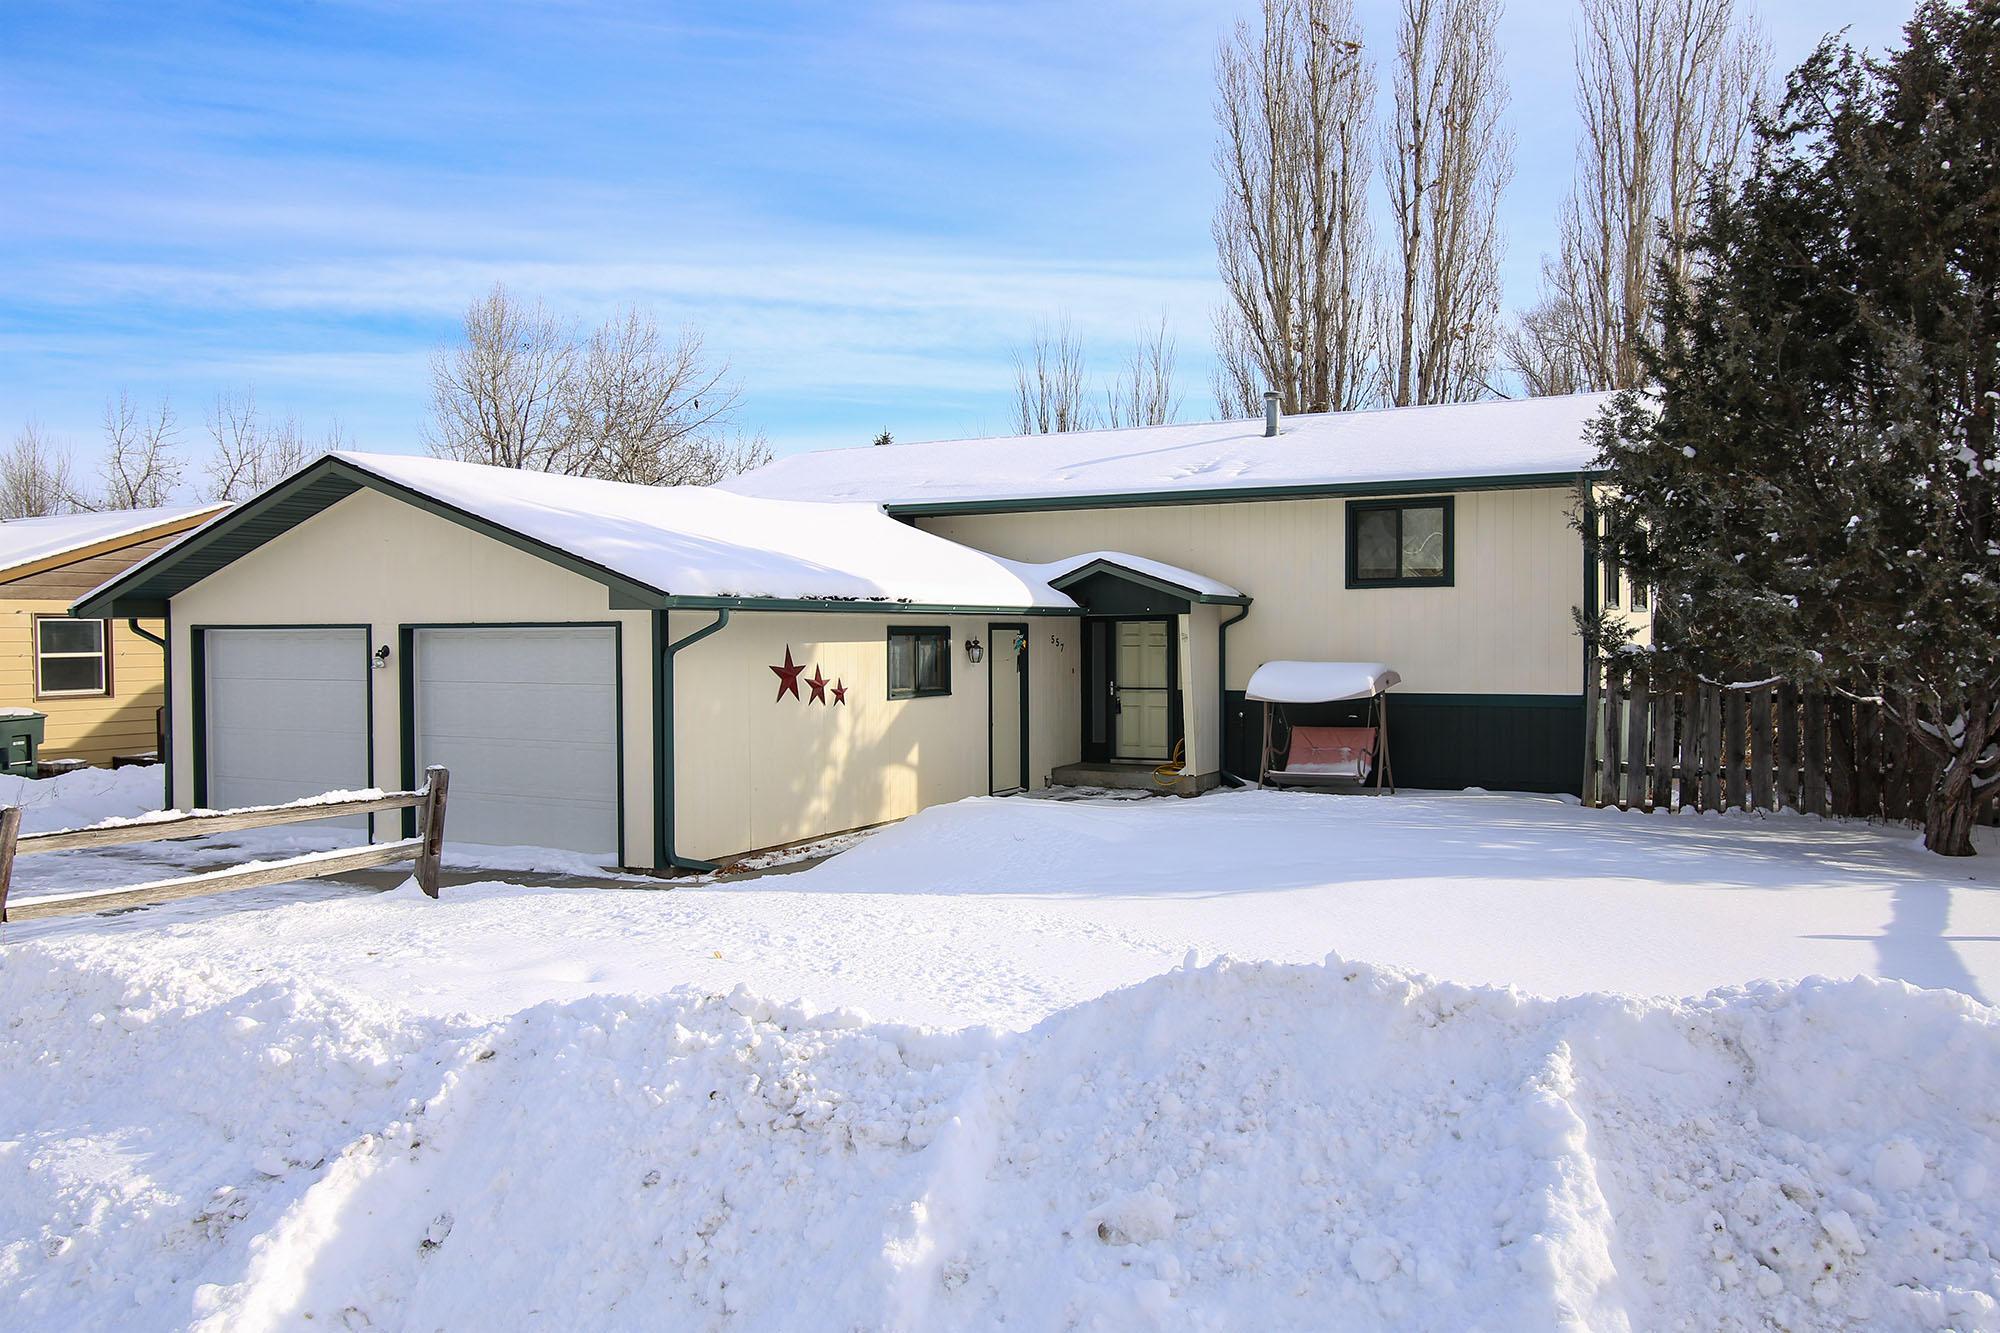 557 Michael Drive, Sheridan, Wyoming 82801, 3 Bedrooms Bedrooms, ,3 BathroomsBathrooms,Residential,For Sale,Michael,19-98